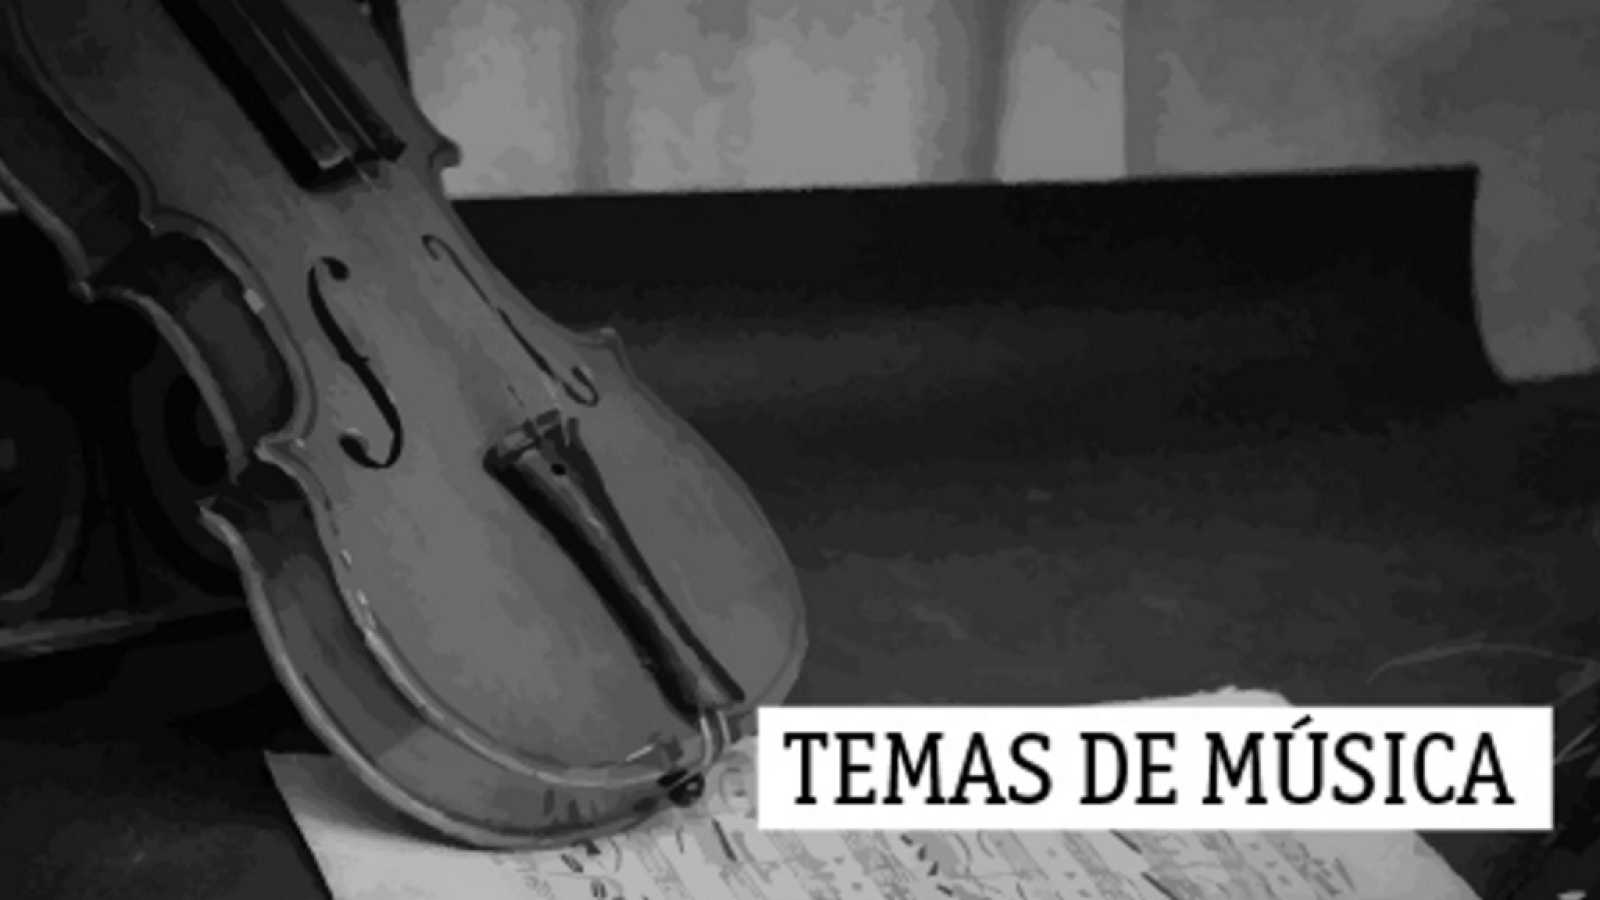 Temas de música - Diálogo a 4: Cuartetos de cuerda de Beethoven (VIII). Gran Fuga  - 26/07/20 - escuchar ahora